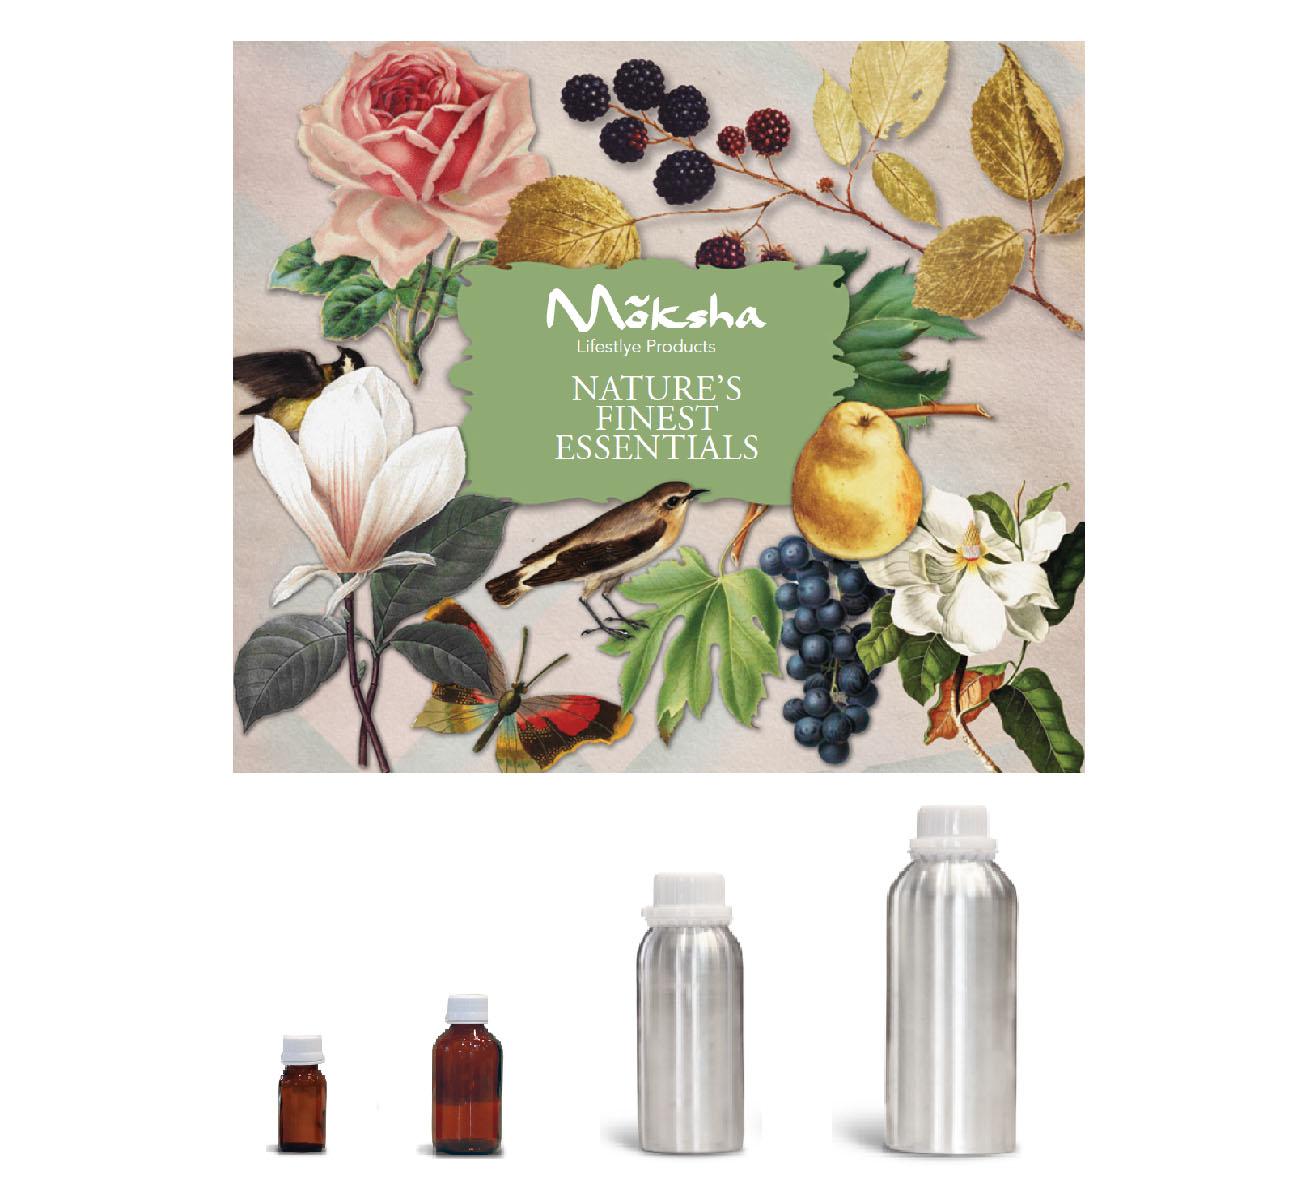 Fragrance-oils| Essential Oils Wholesale | Essential Oil